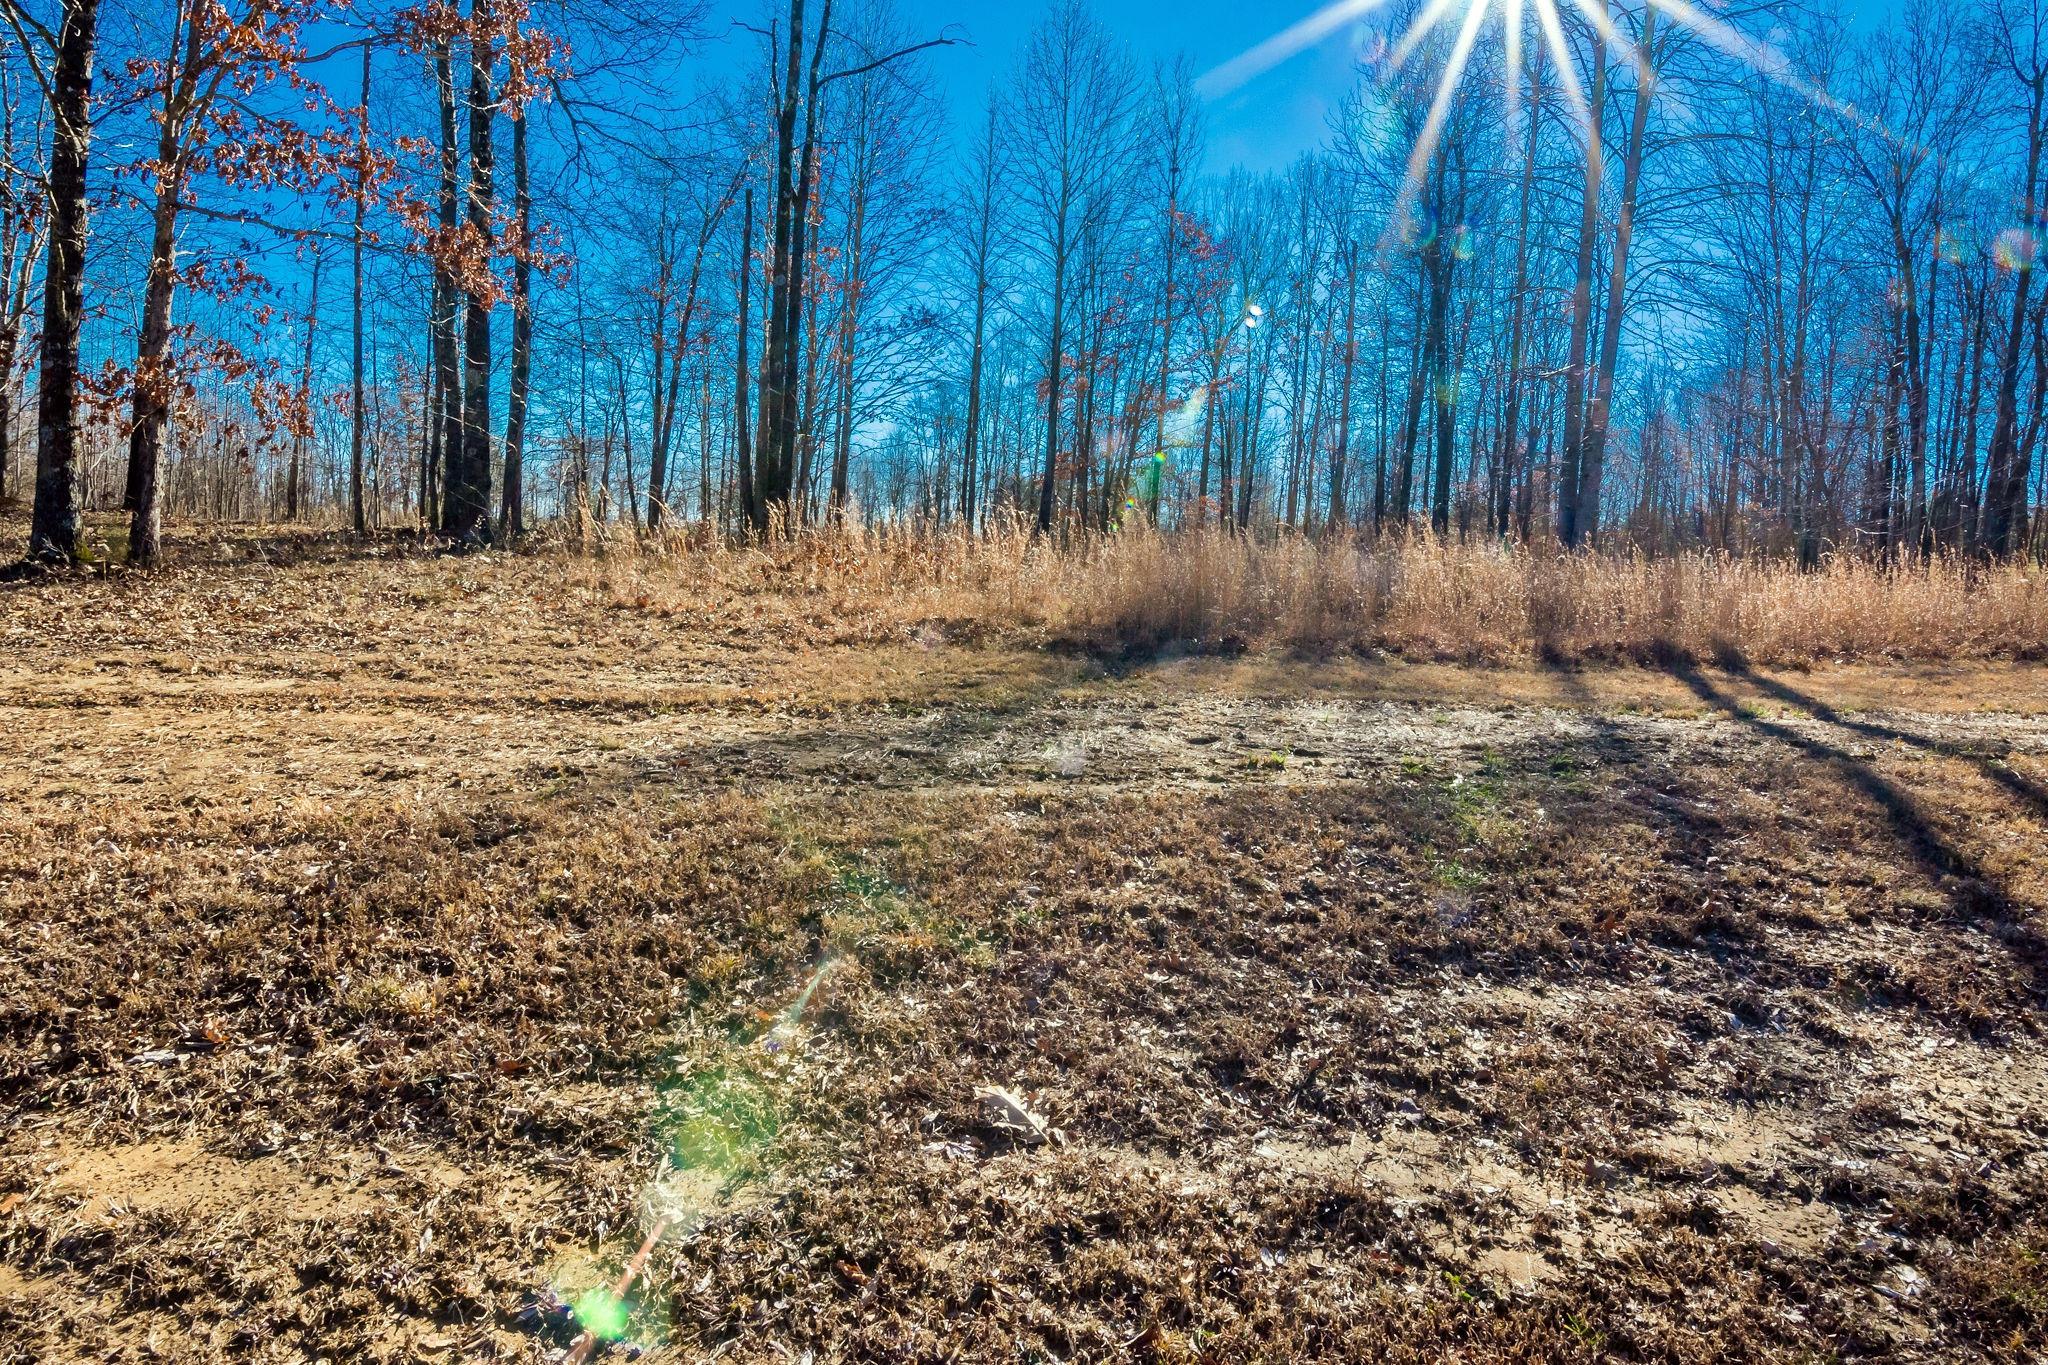 515 Wilderness Way, Dunlap, TN 37327